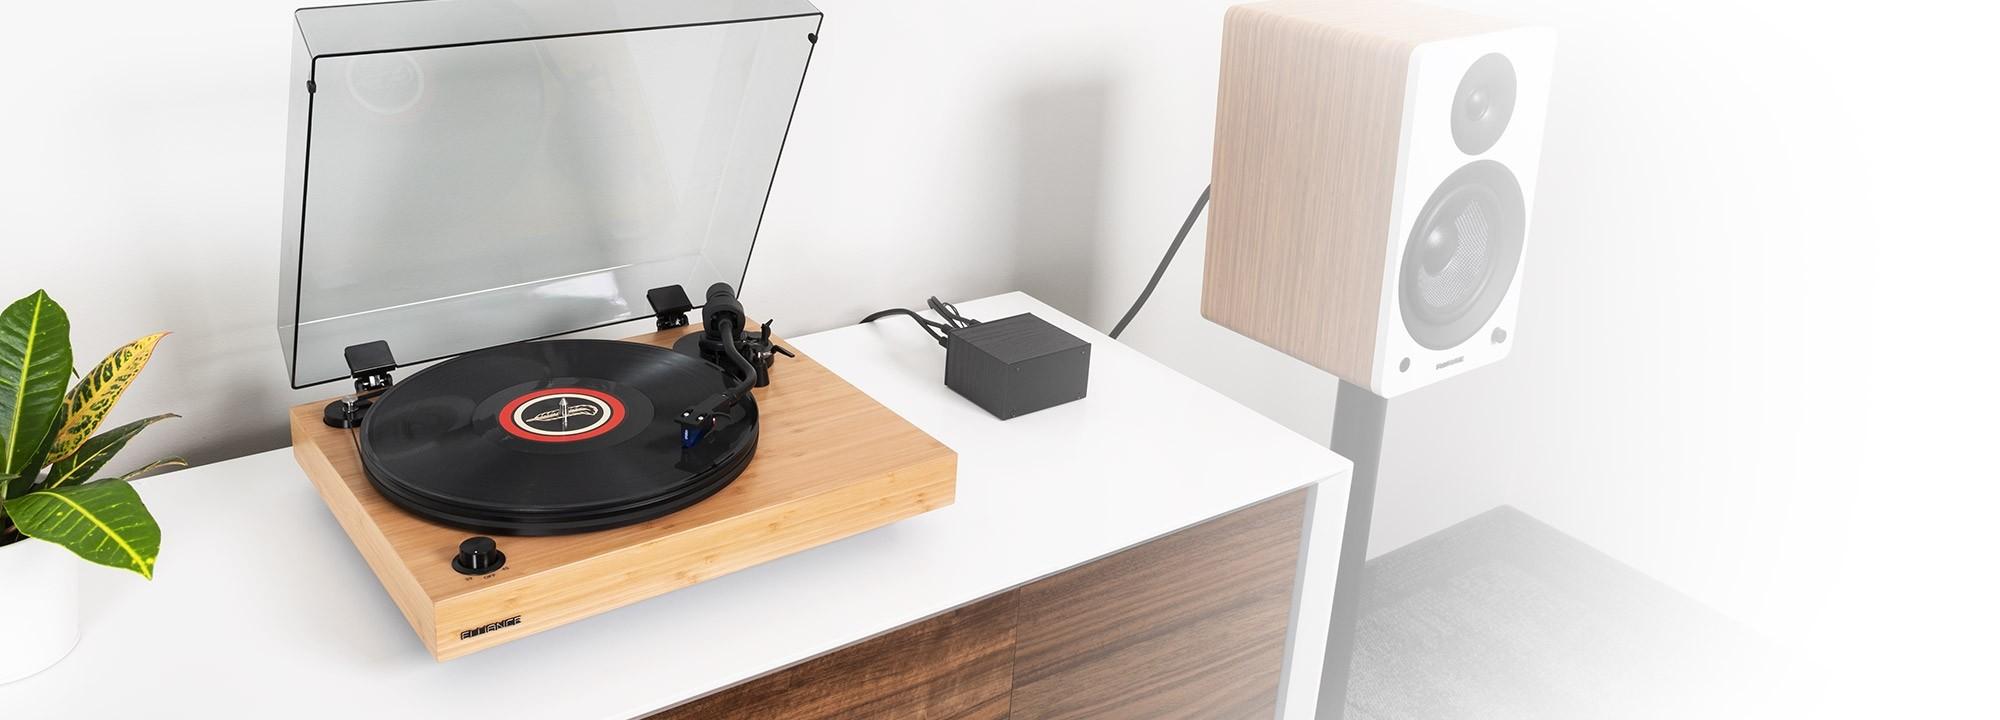 RT84B Reference High Fidelity Vinyl Turntable - Lifestyle Desktop